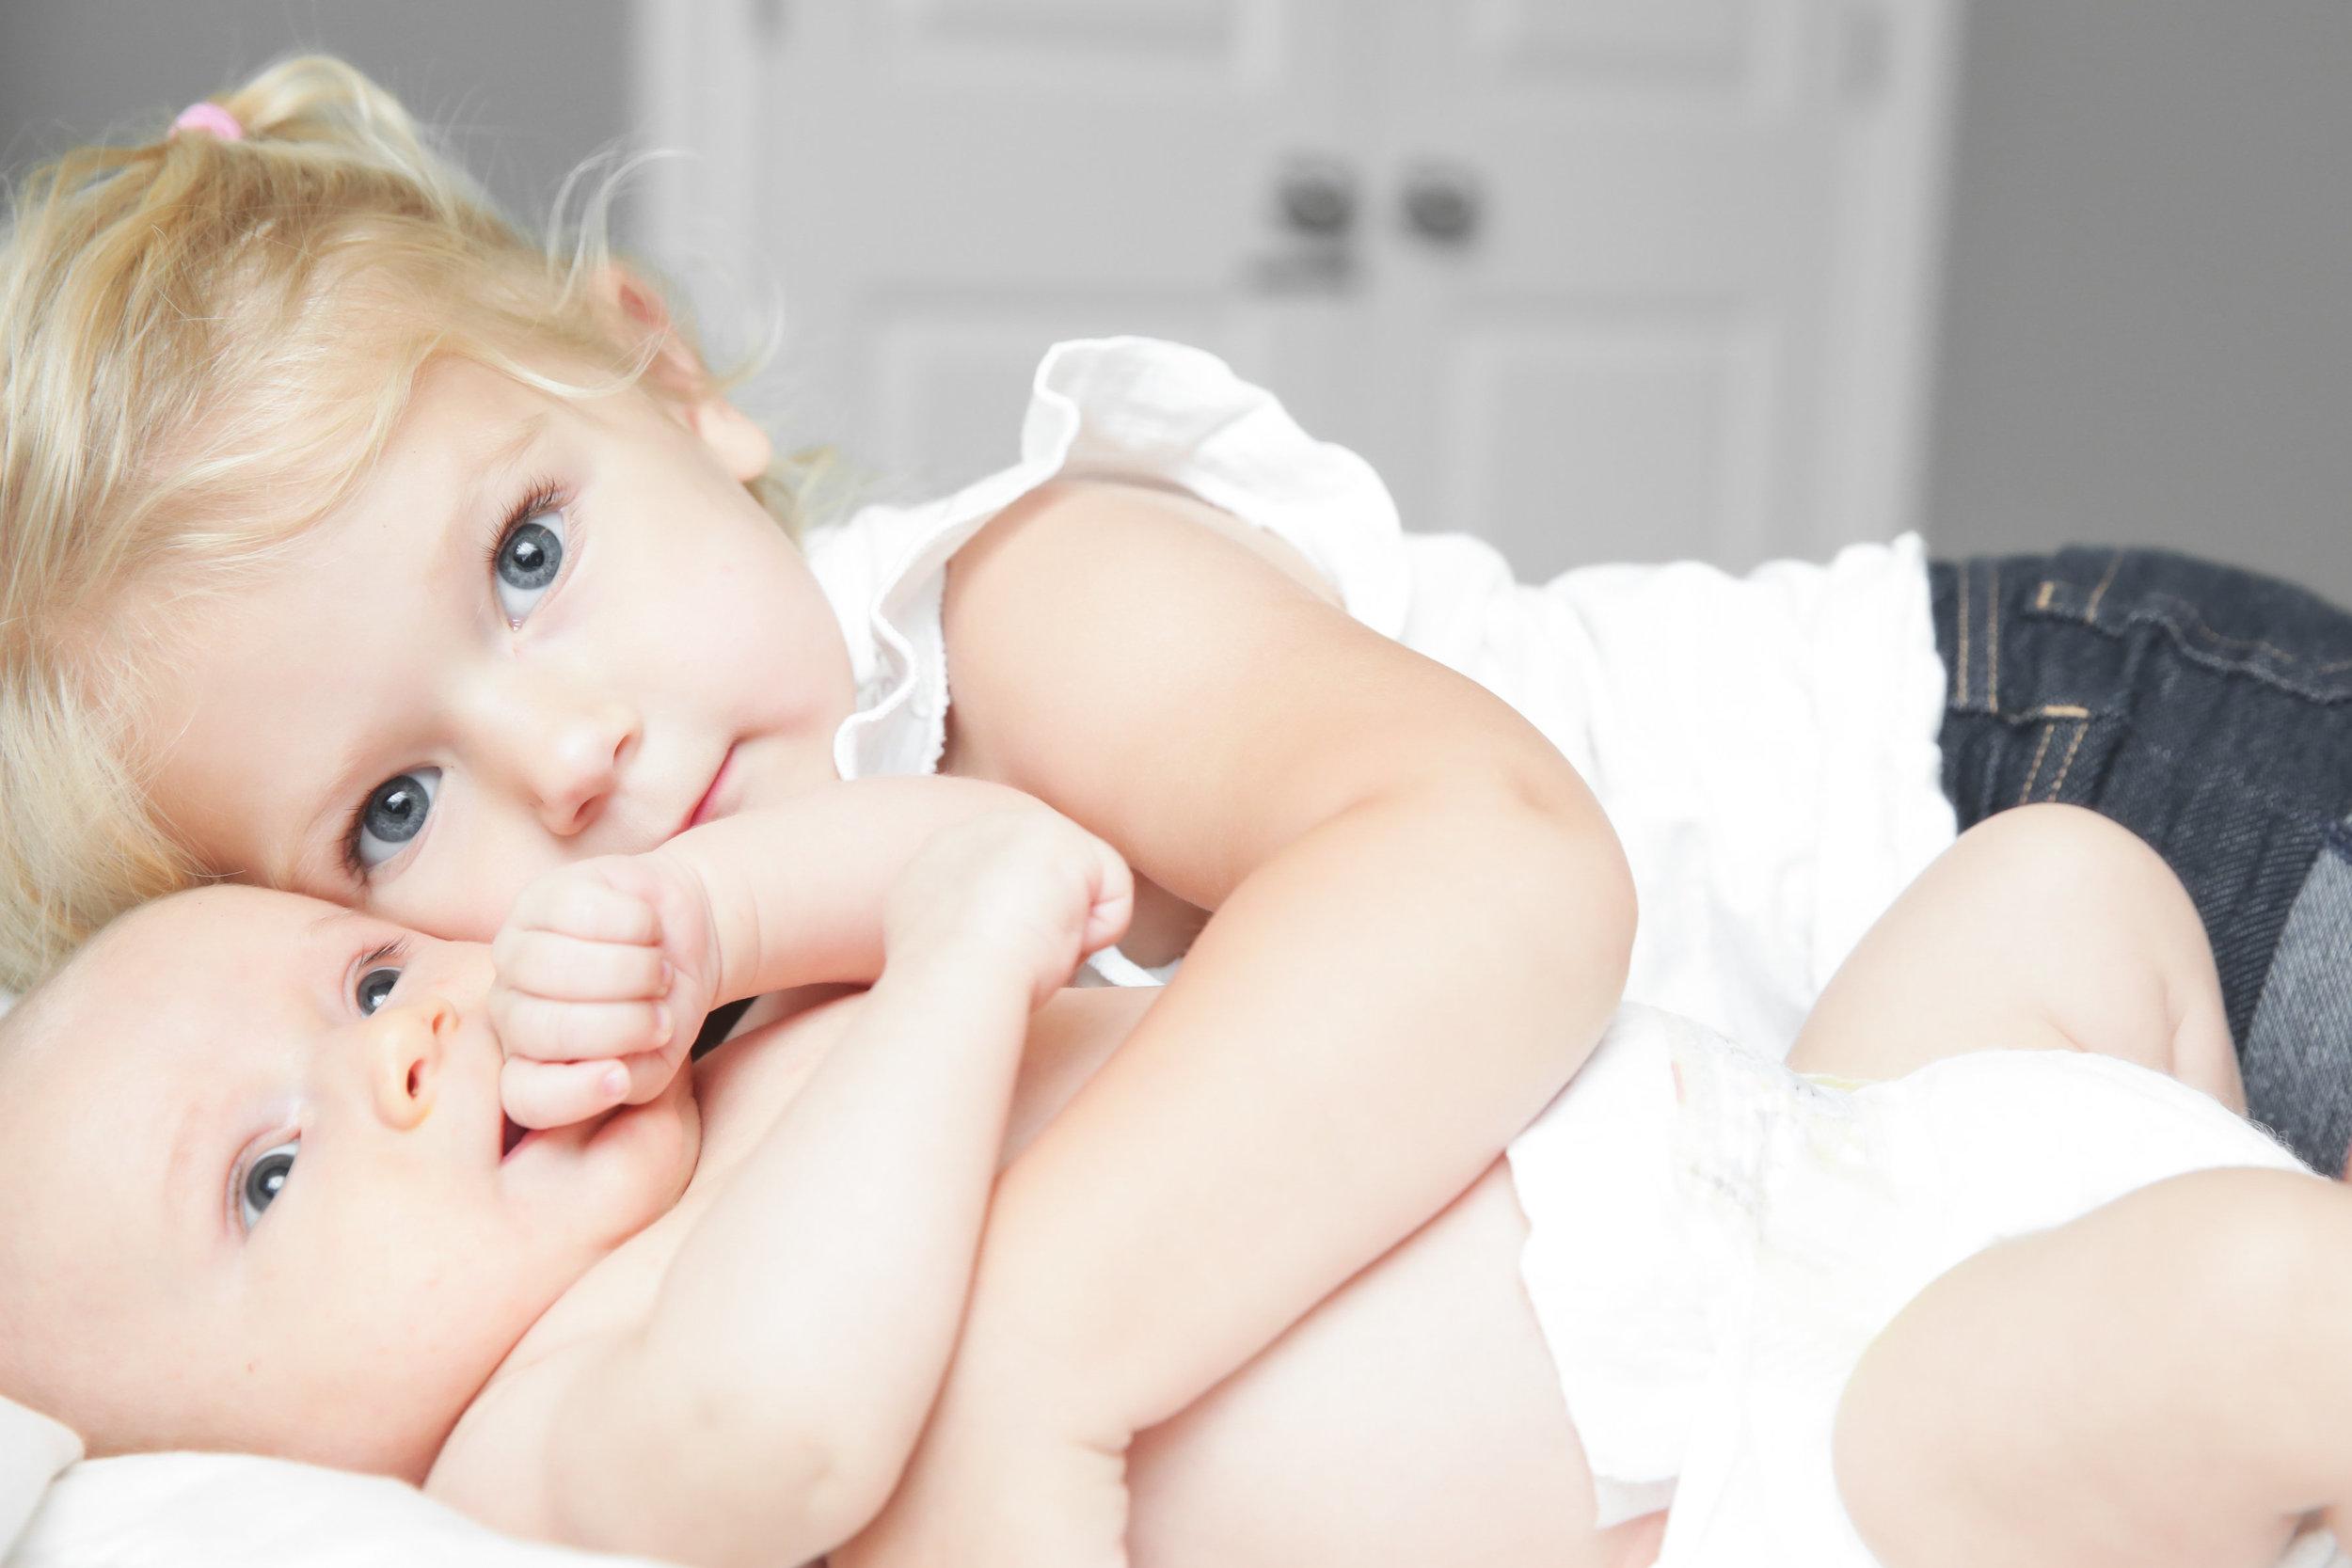 JJ-Ignotz-NYC-Photographer-babies_018.JPG